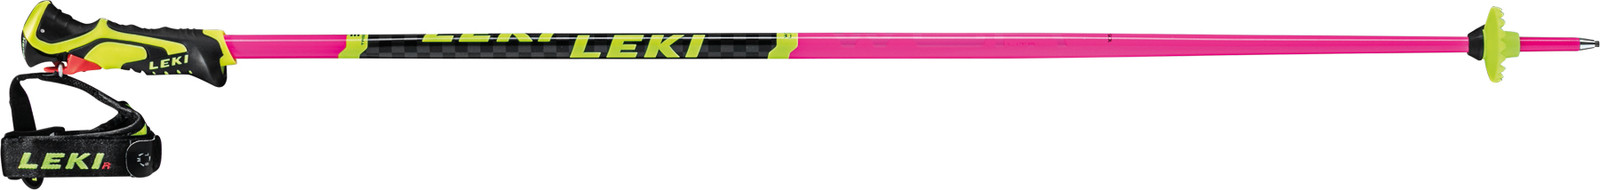 Leki World Cup Lite SL 3D Trigger S Jr Poles *PINK*